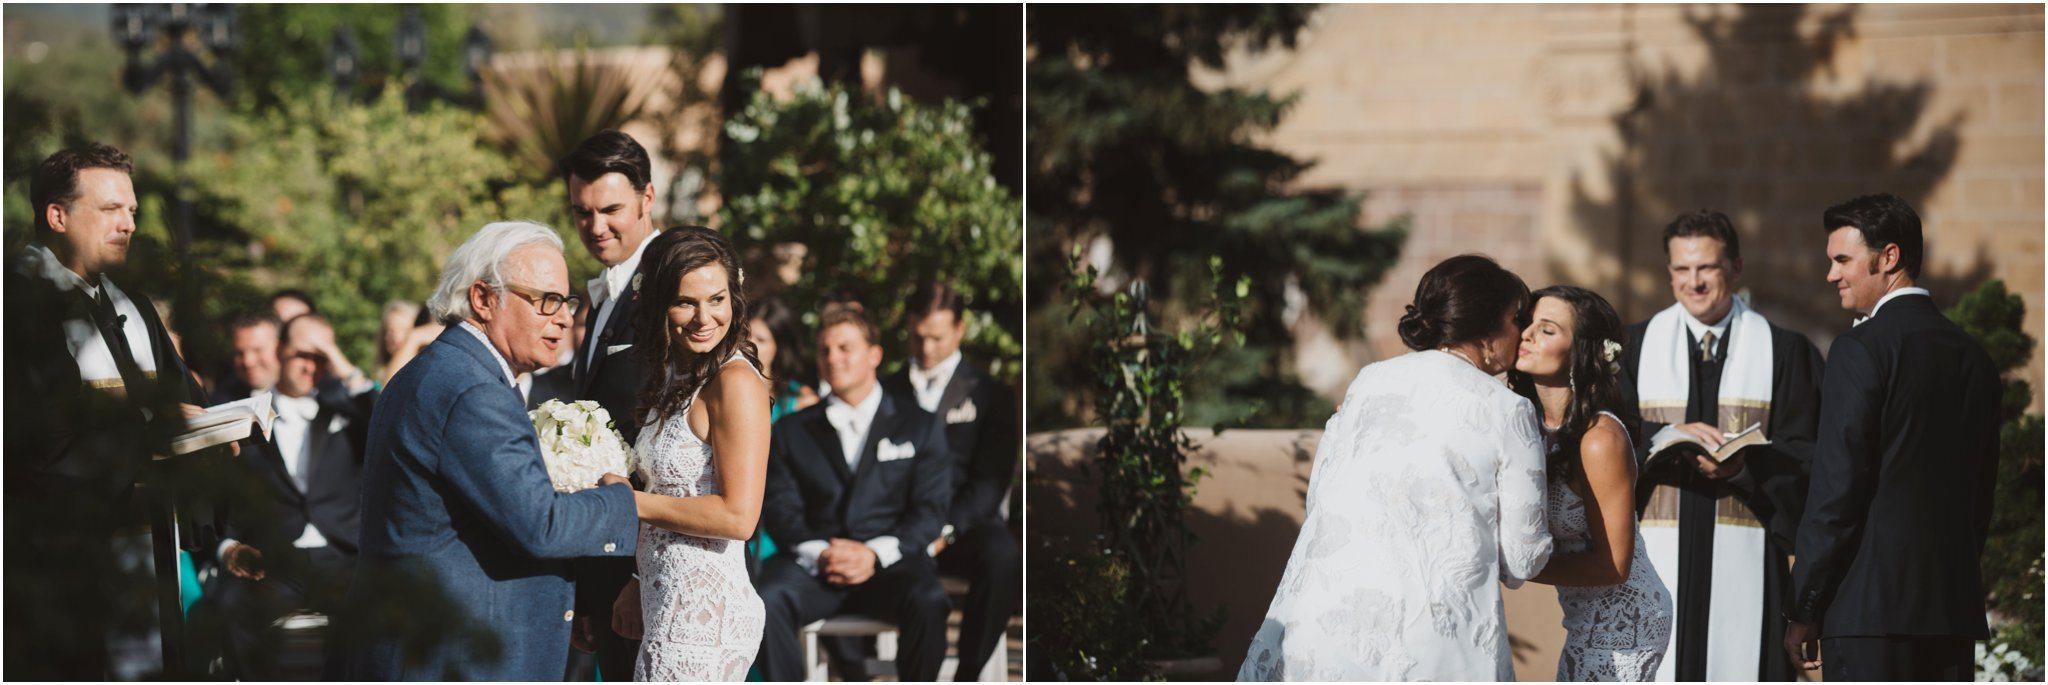 0048santa-fe-wedding-photographer_albuquerque-wedding-photographer_-southwest-wedding-photography_-blue-rose-studio